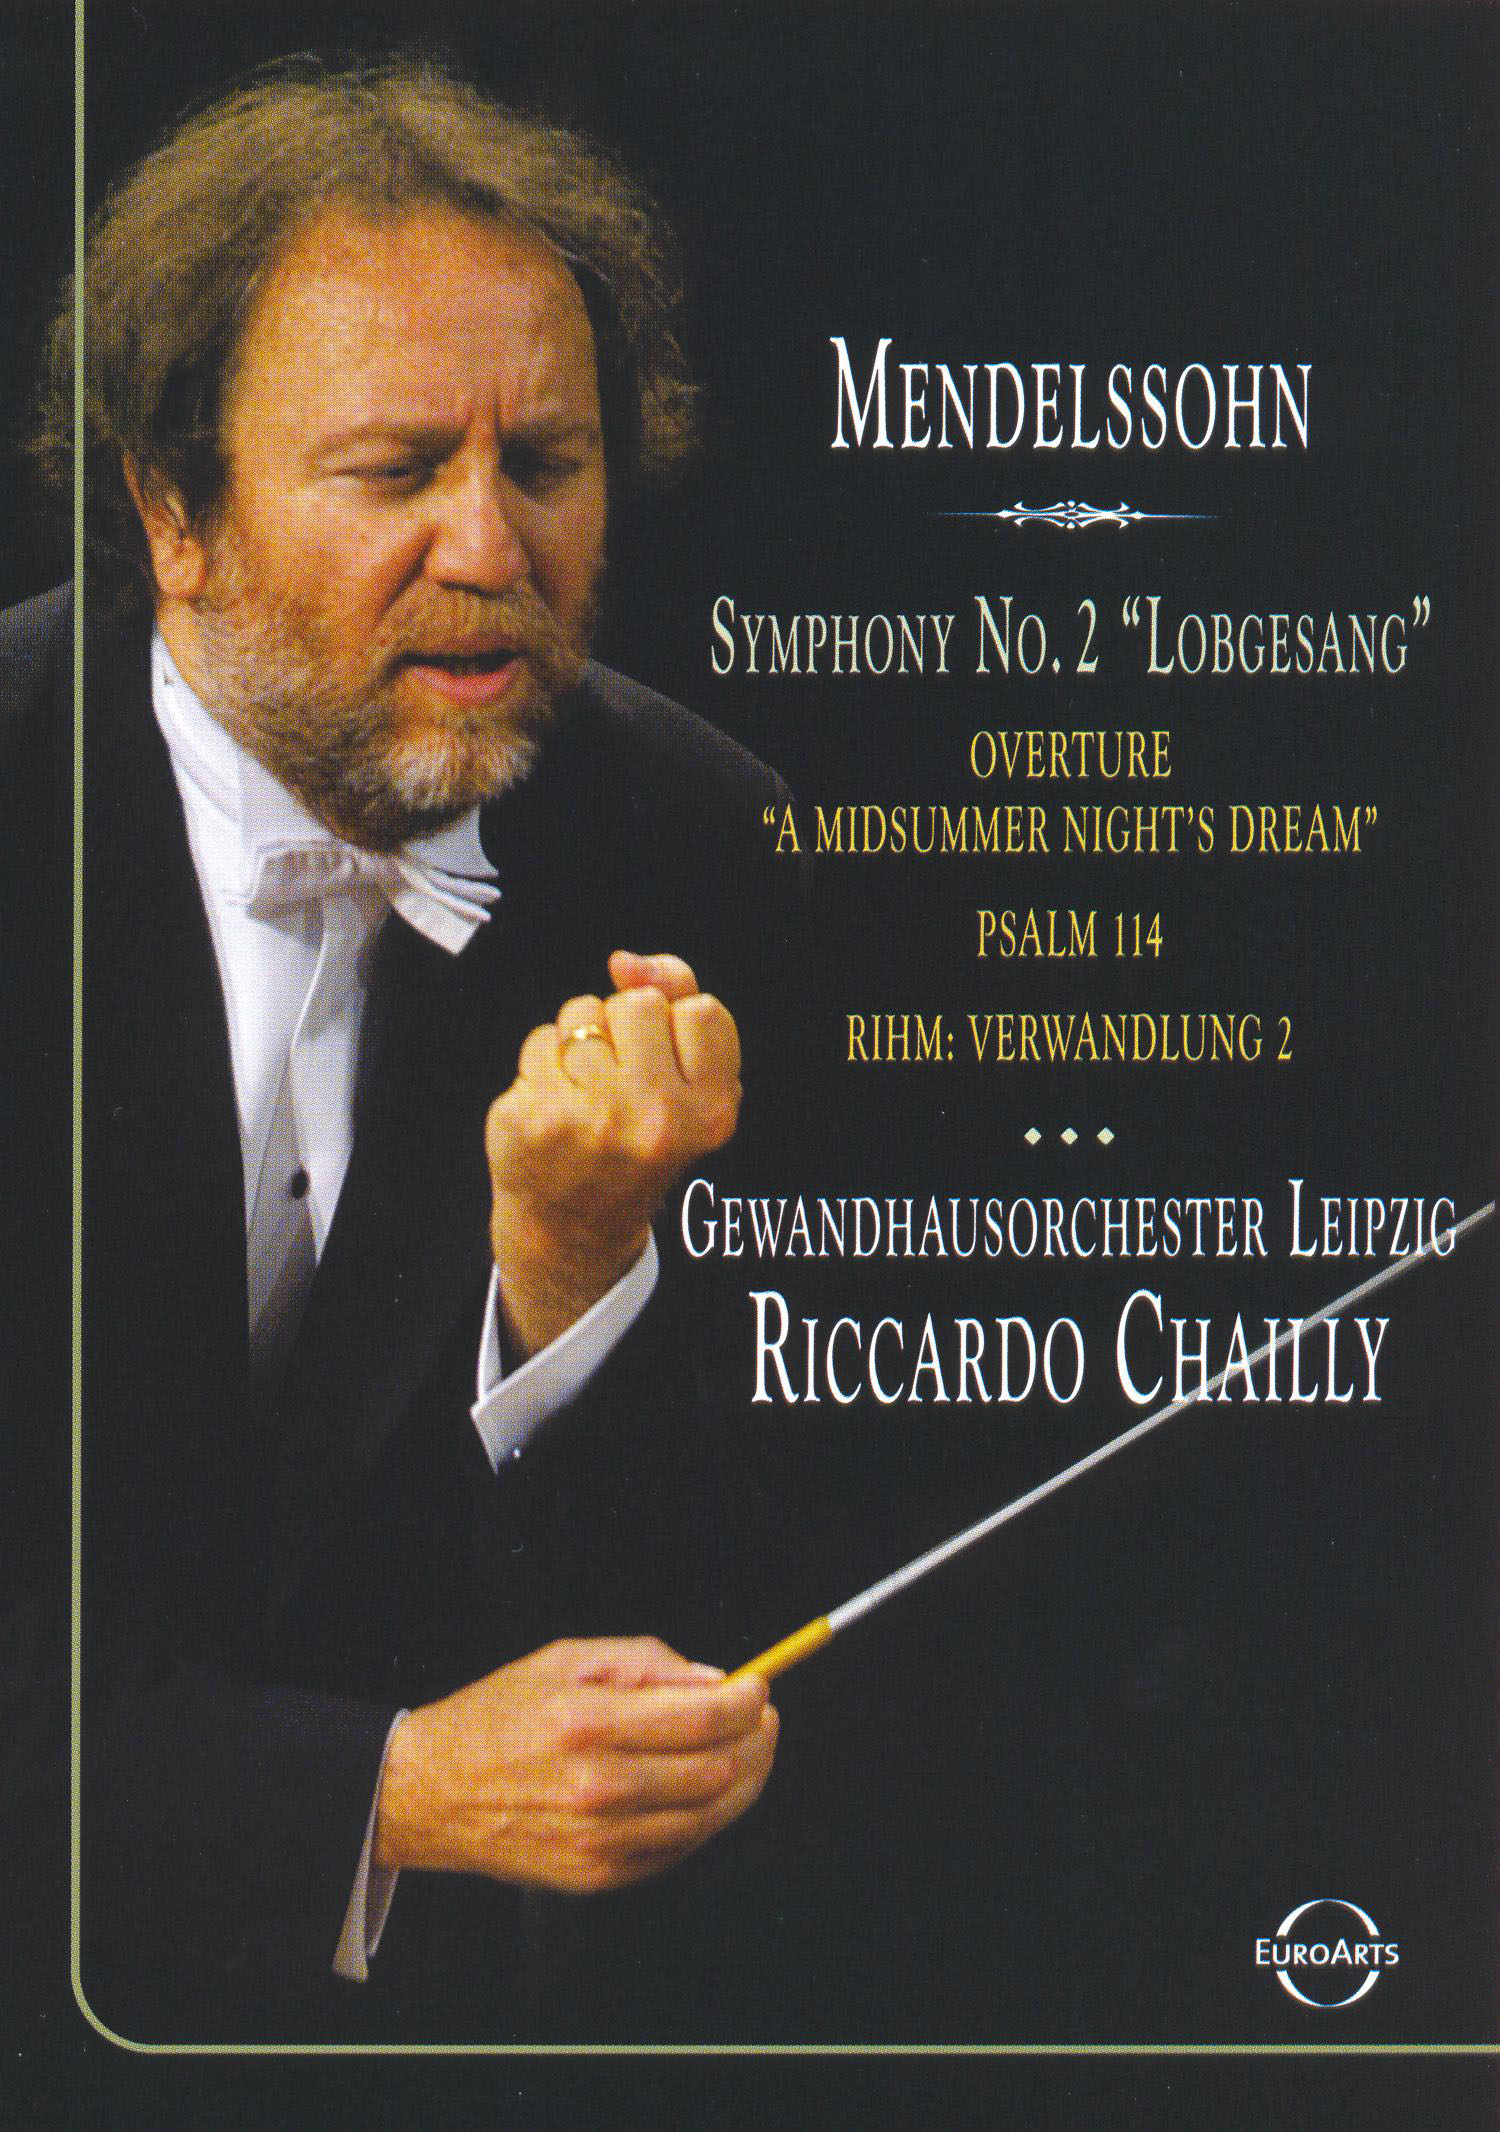 Mendelssohn: Symphony No. 2 - Lobgesang